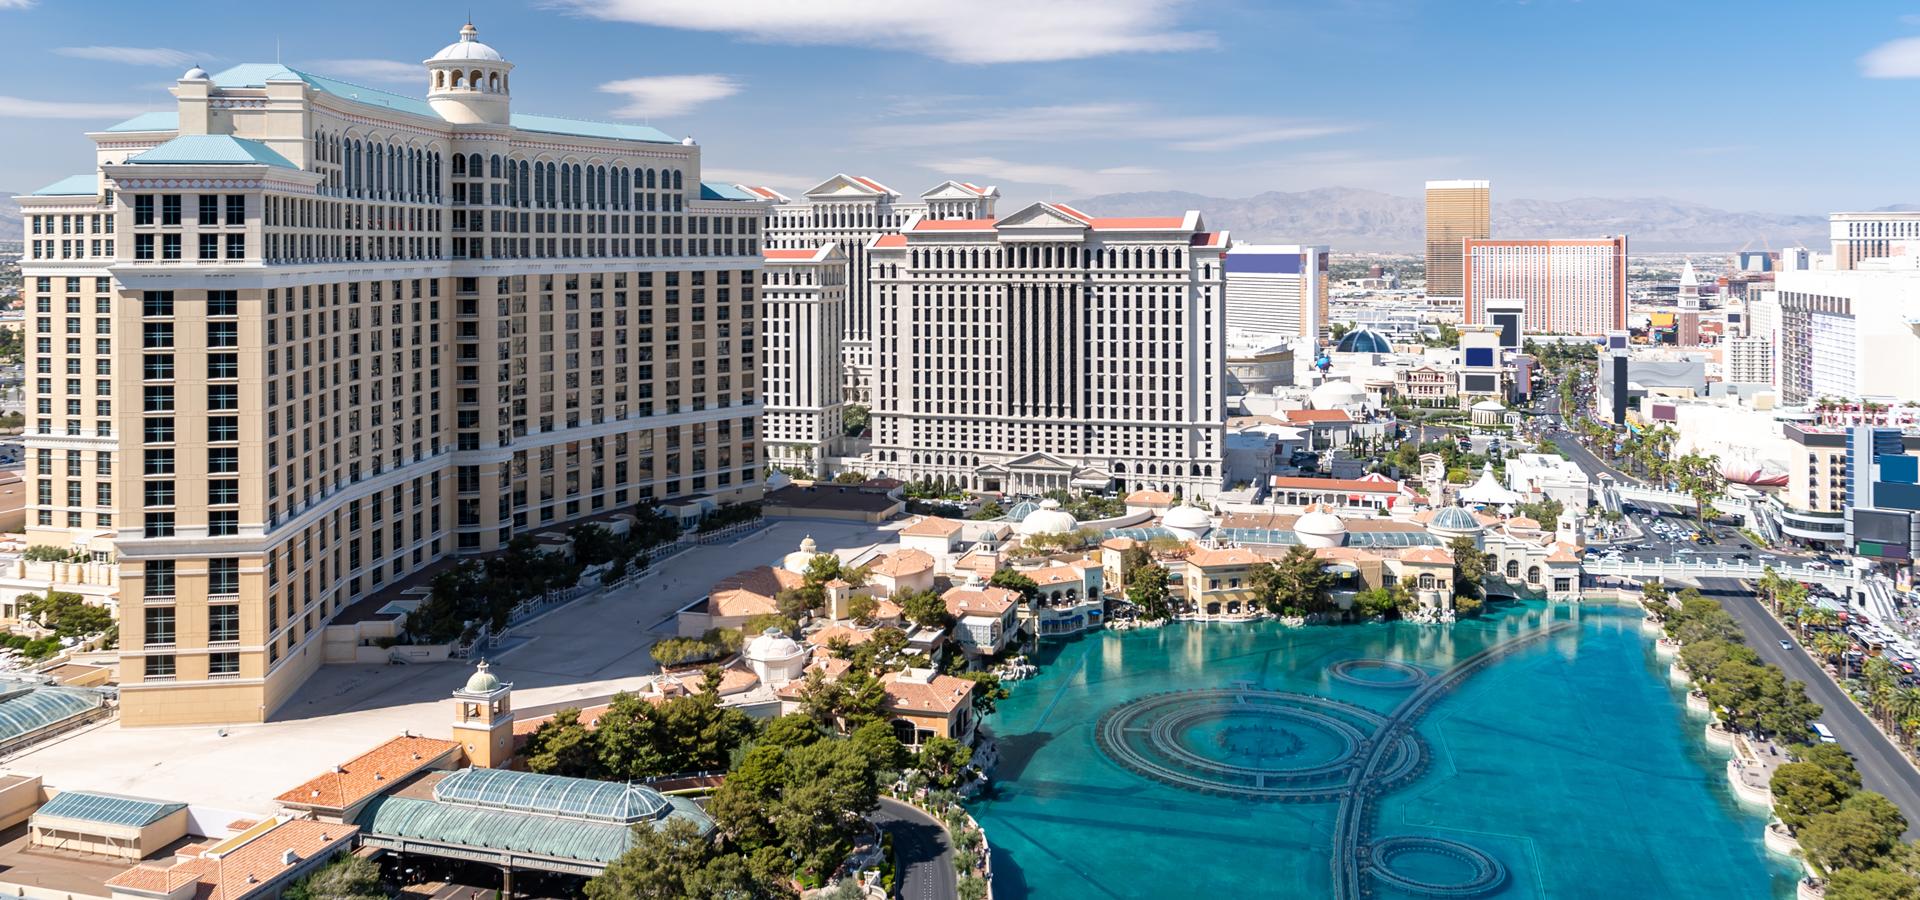 Peer-to-peer advisory in Las Vegas, Nevada, USA